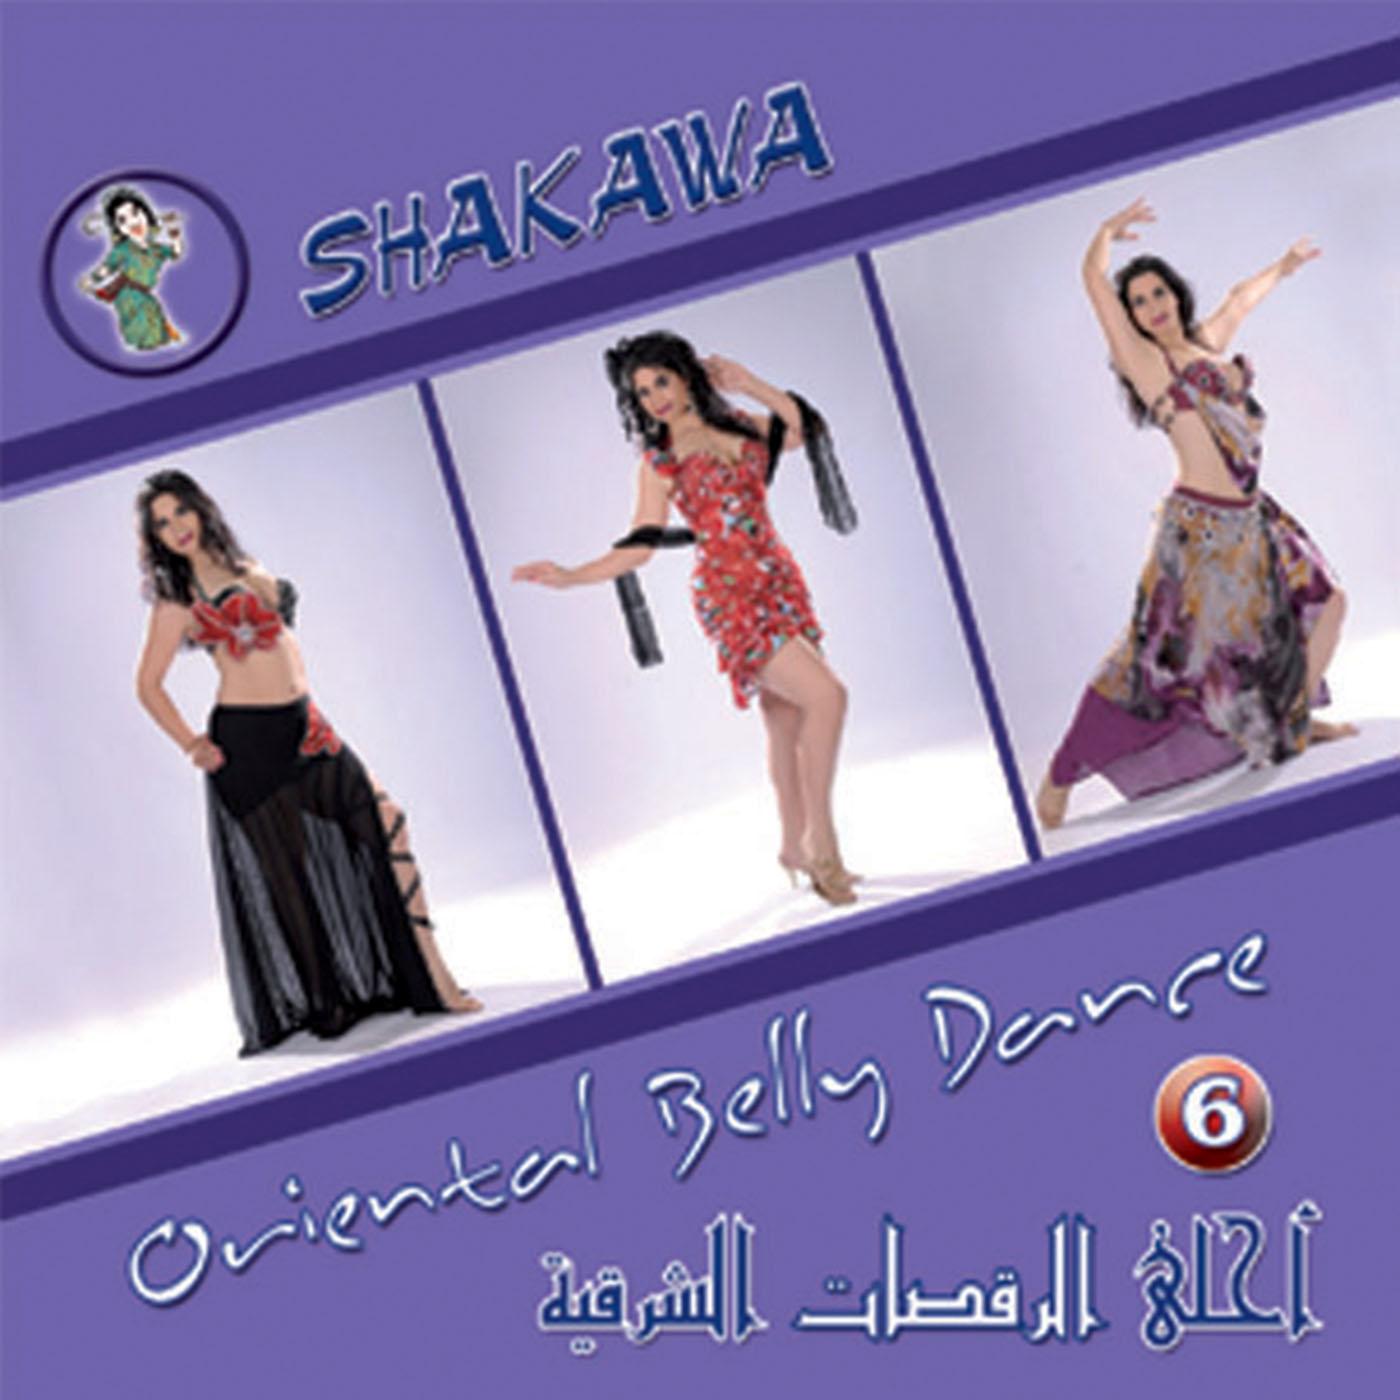 SHAKAWA (Oriental Belly Dance 6 )/  VARIOUS ARTISTS    BUY IT